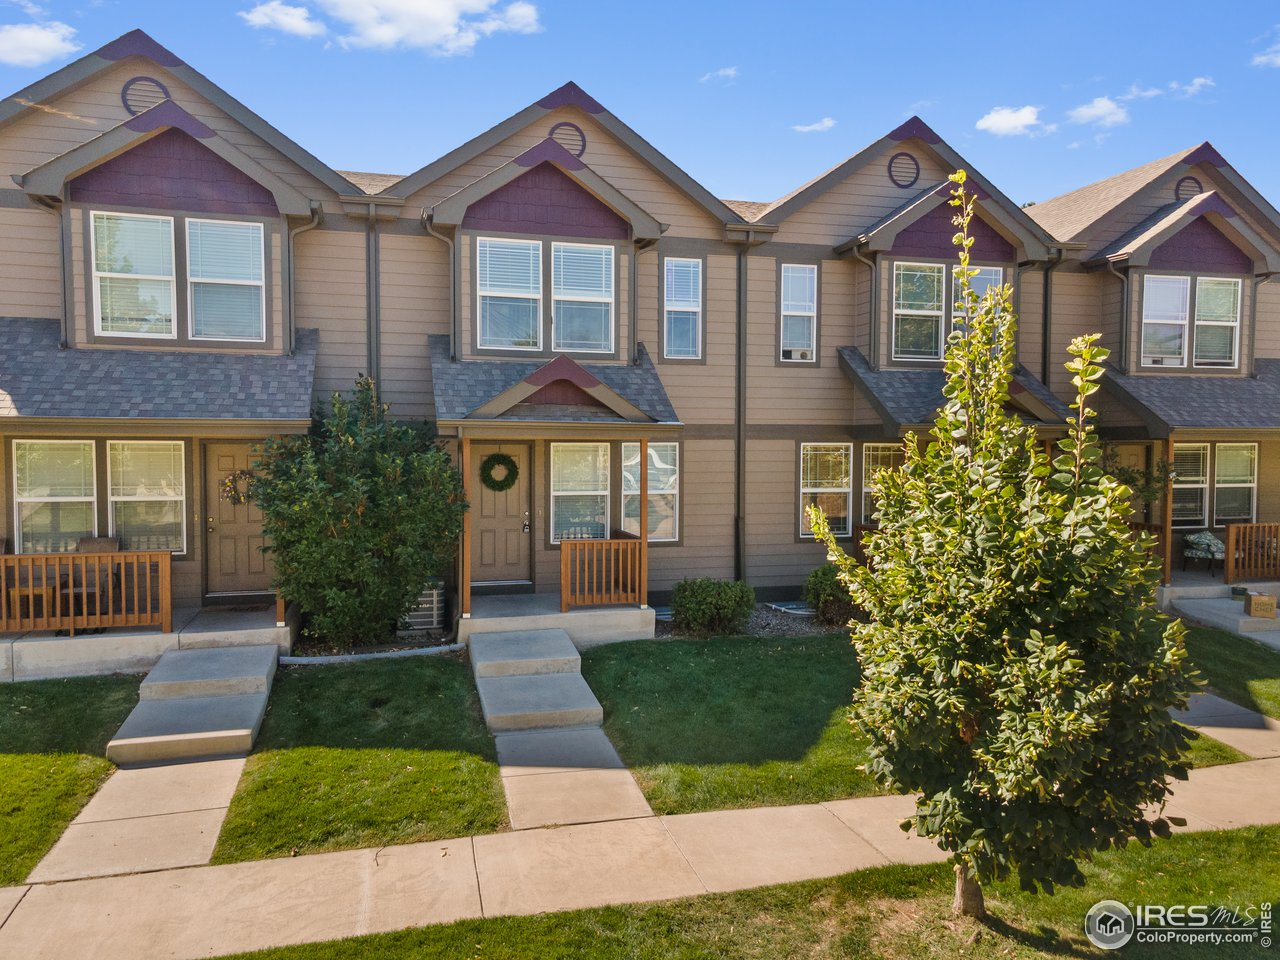 615 Ebon Pica St, Fort Collins CO 80521